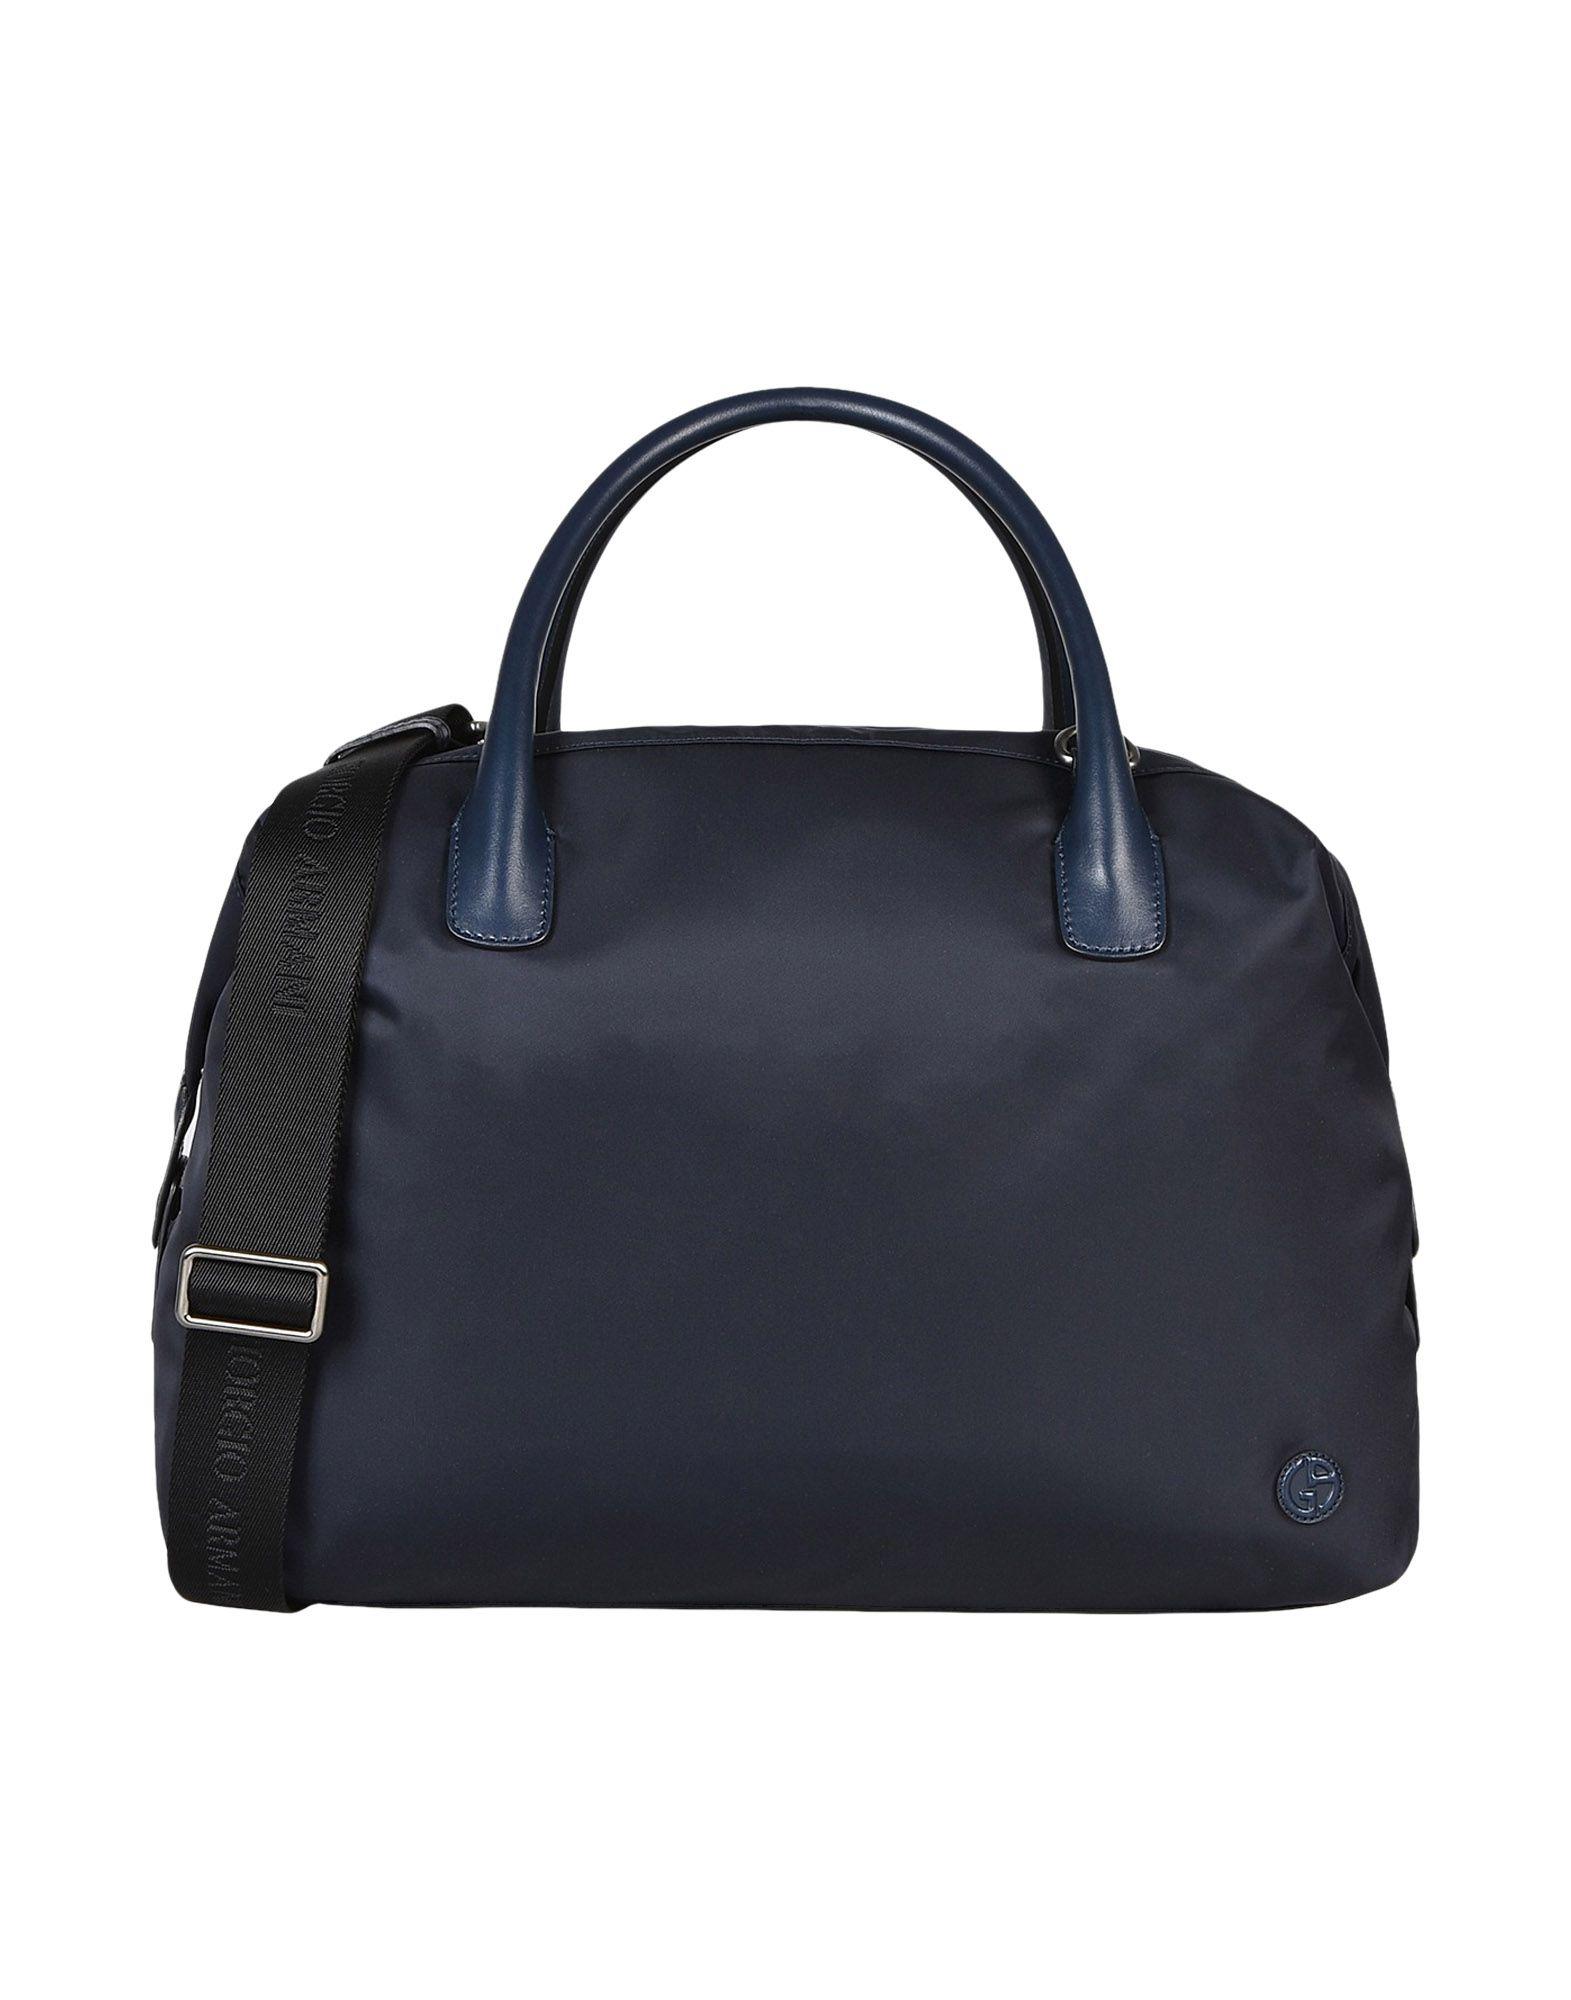 GIORGIO ARMANI Деловые сумки плечевой ремень триммера 1800sp td